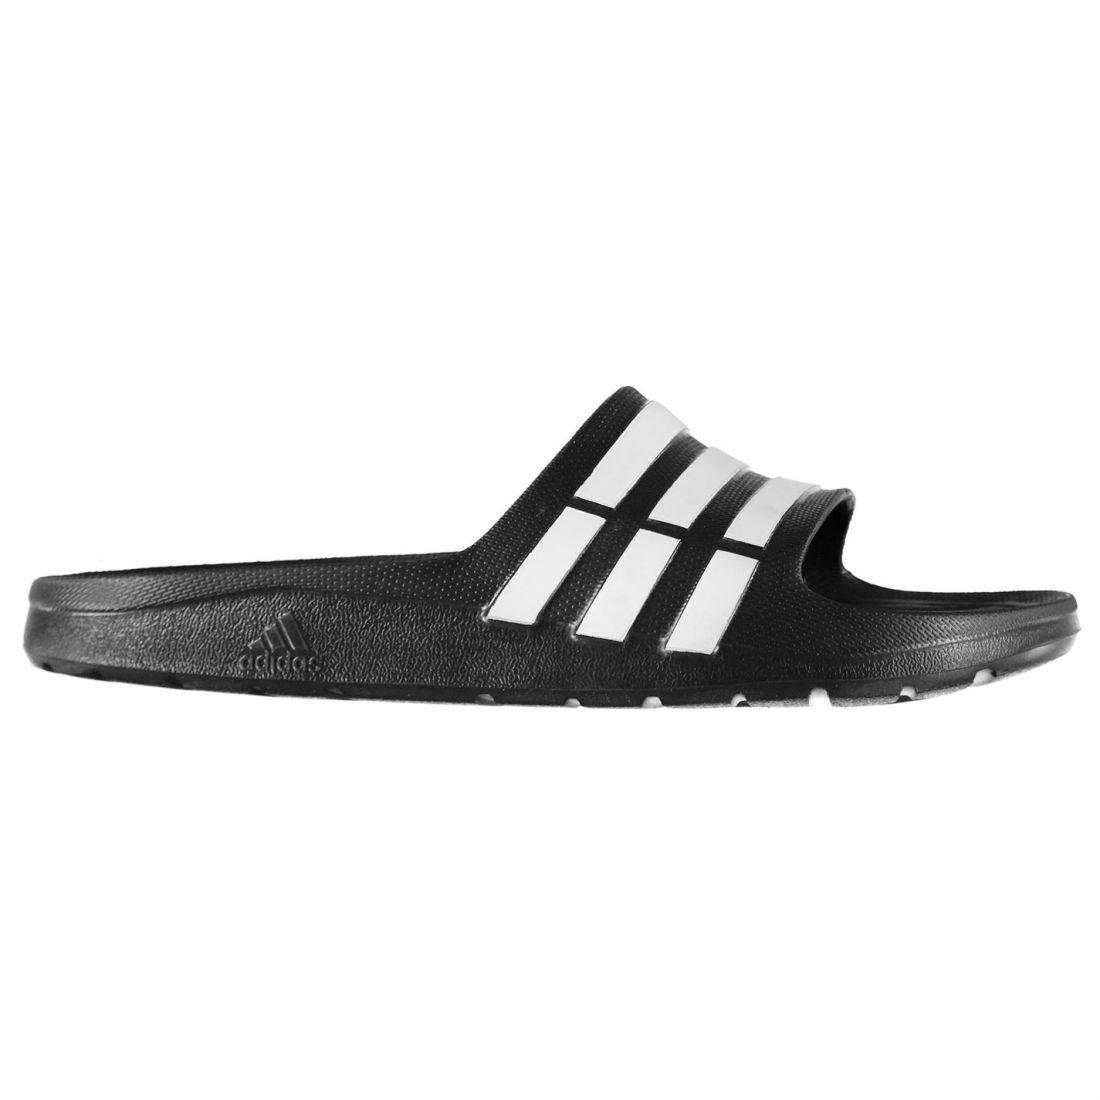 32cfda5392f80 adidas Kids Duramo Junior Sliders Pool Shoes Flip Flops Beach ...